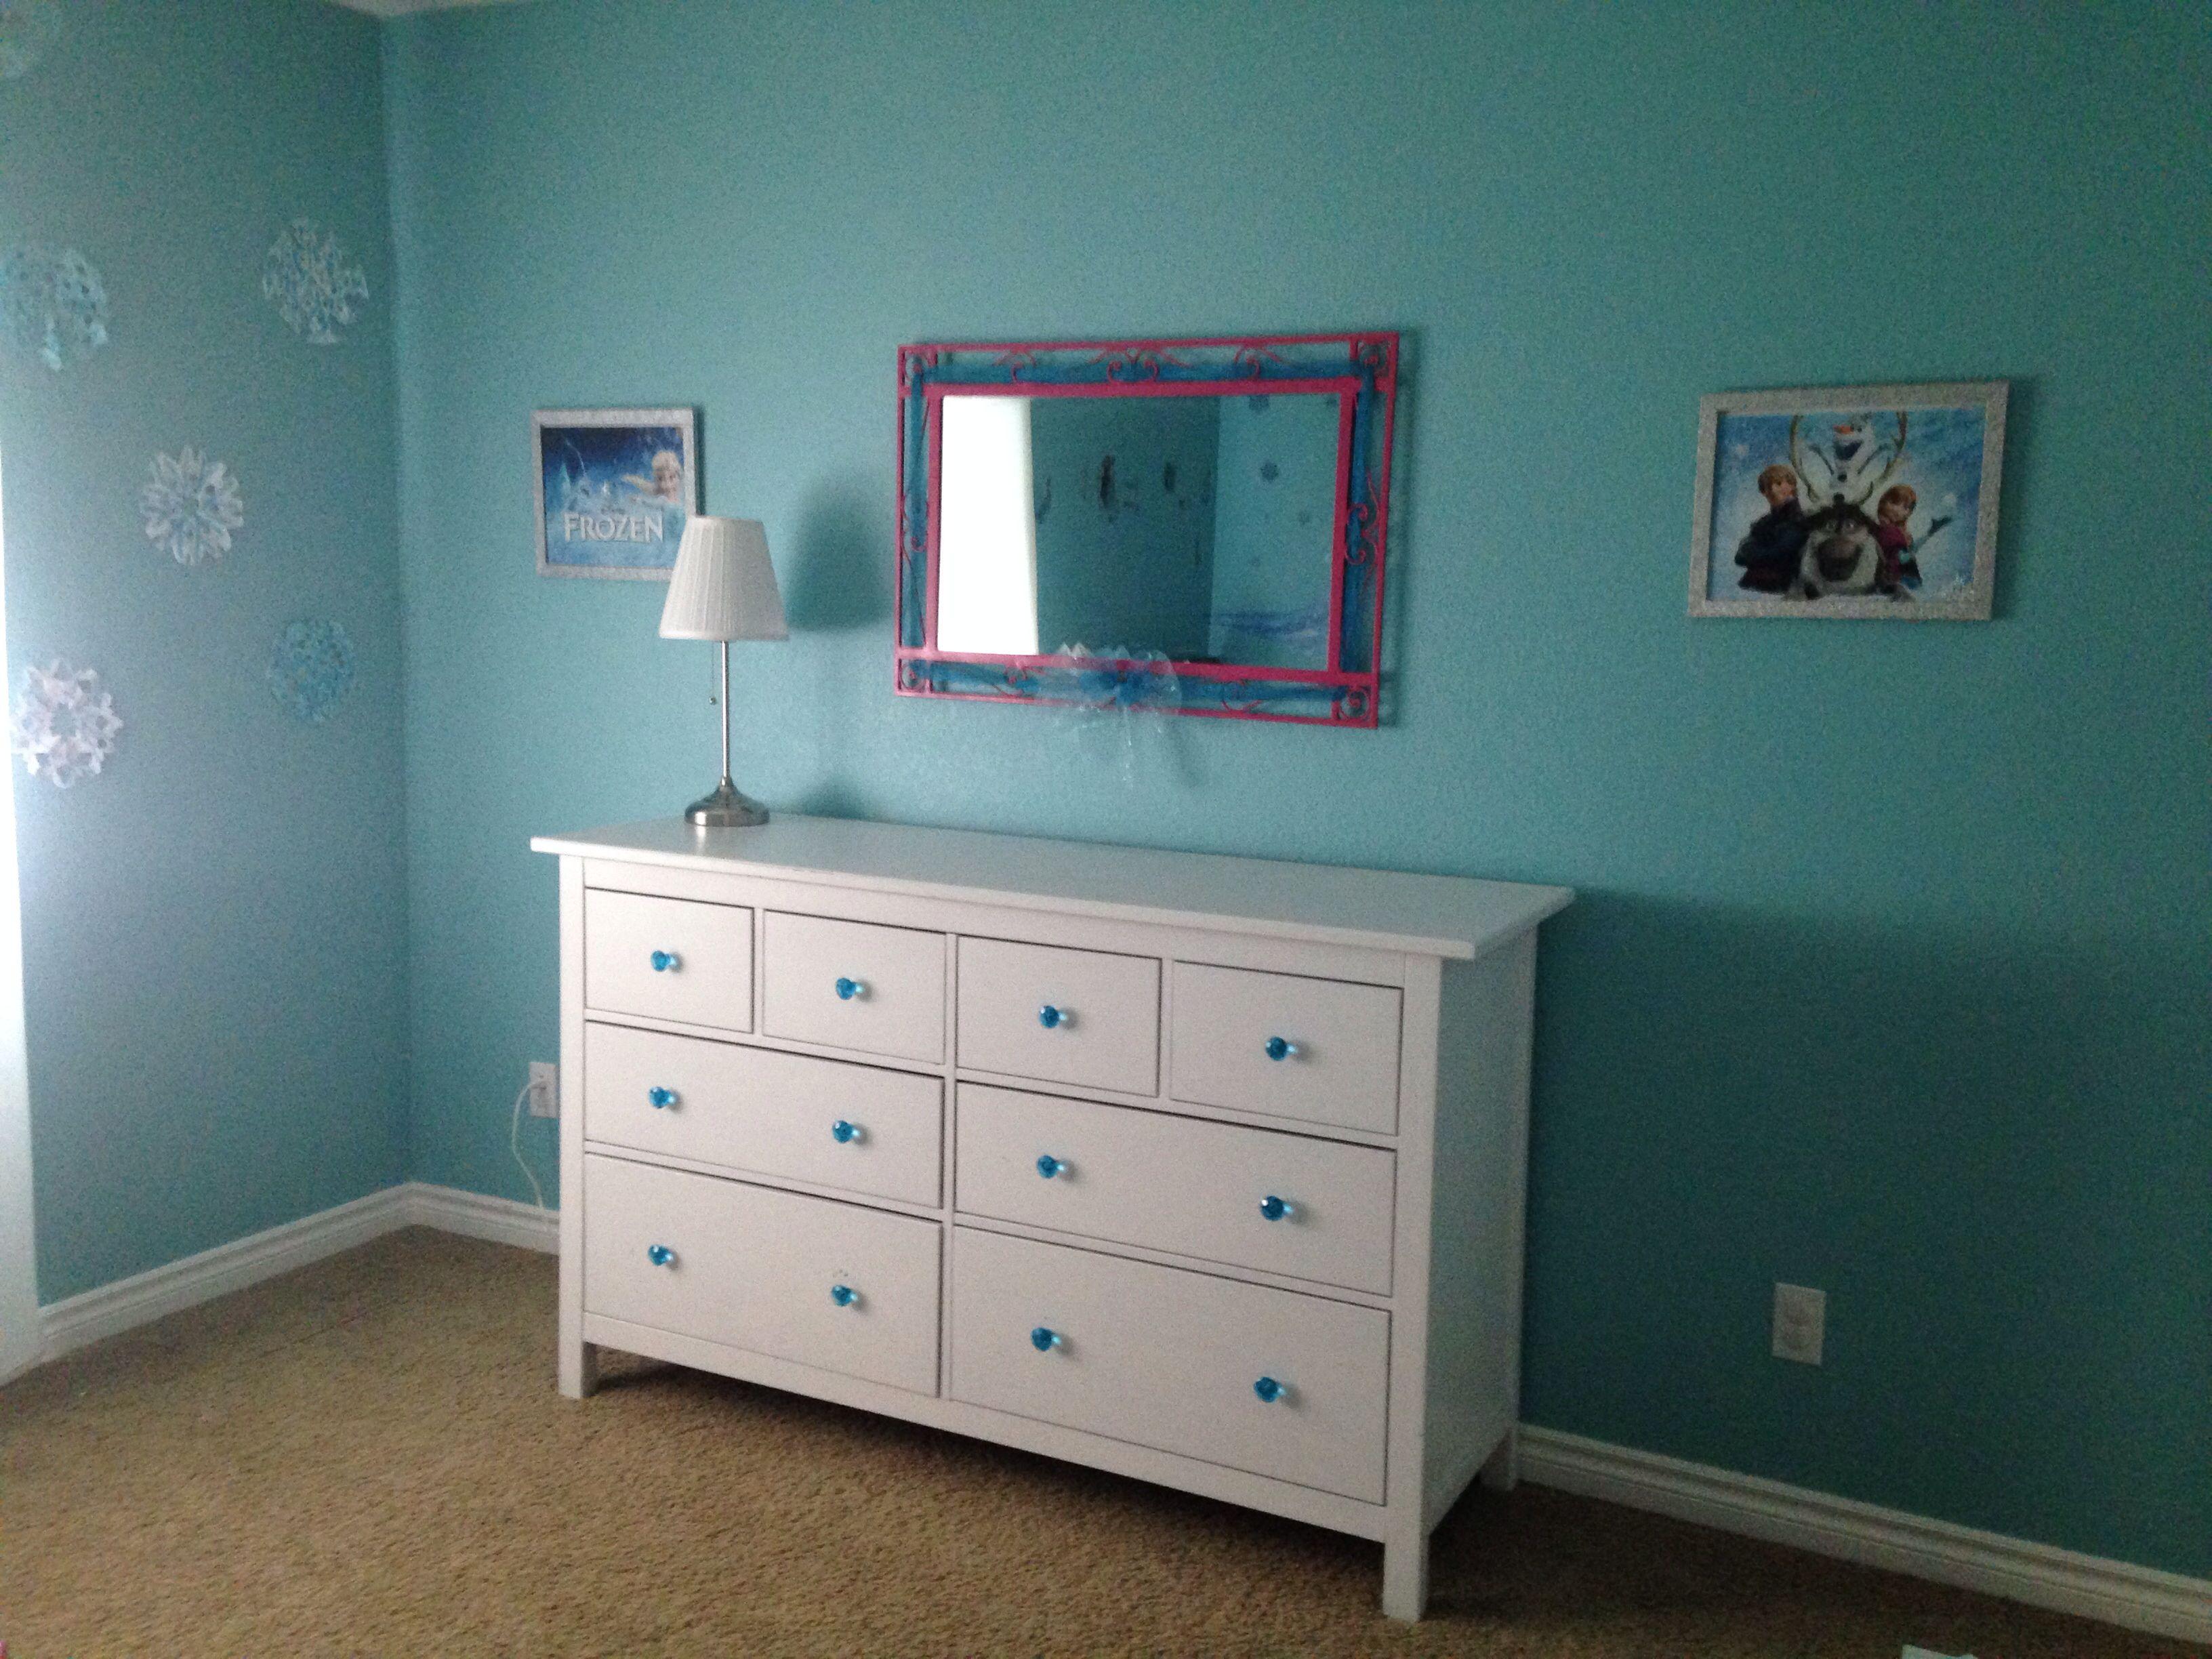 Frozen inspired bedroom - Disney S Frozen Inspired Bedroom Prints From Disney Store In Silver Glitter Frames From Michael S